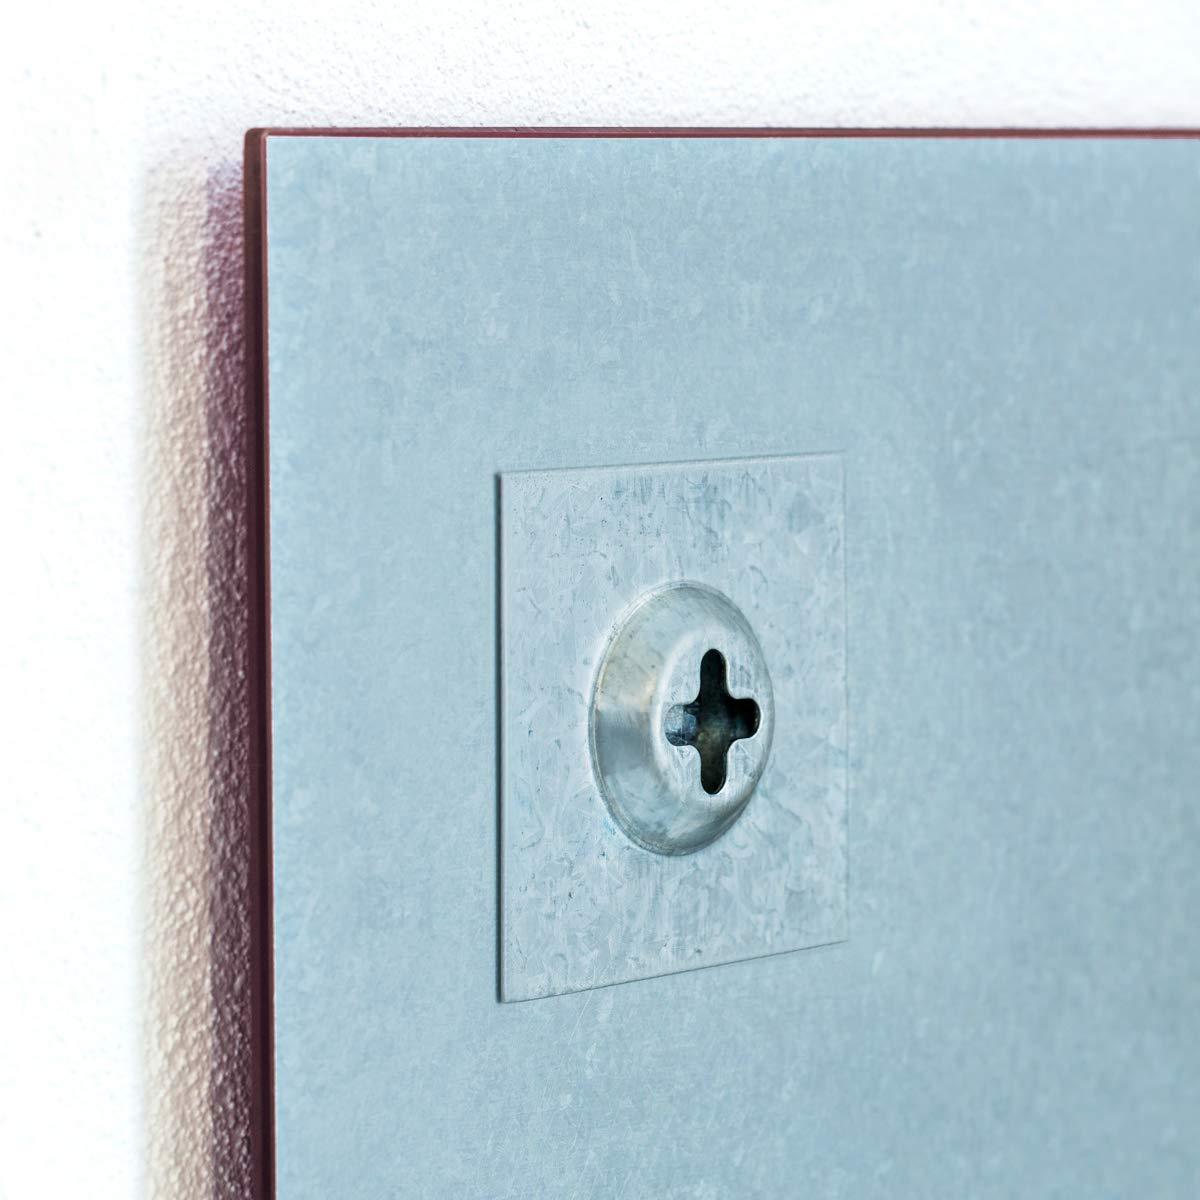 100 x 60 cm Memoboard Gelb Ultra Clear Glass /® Glas Whiteboard Pure Farbe Glas Expert 1 Marker Magnetwand   Tafell/öscher 3 Magnete 1 Board-Eraser Smart Glass Board /® Magnettafel